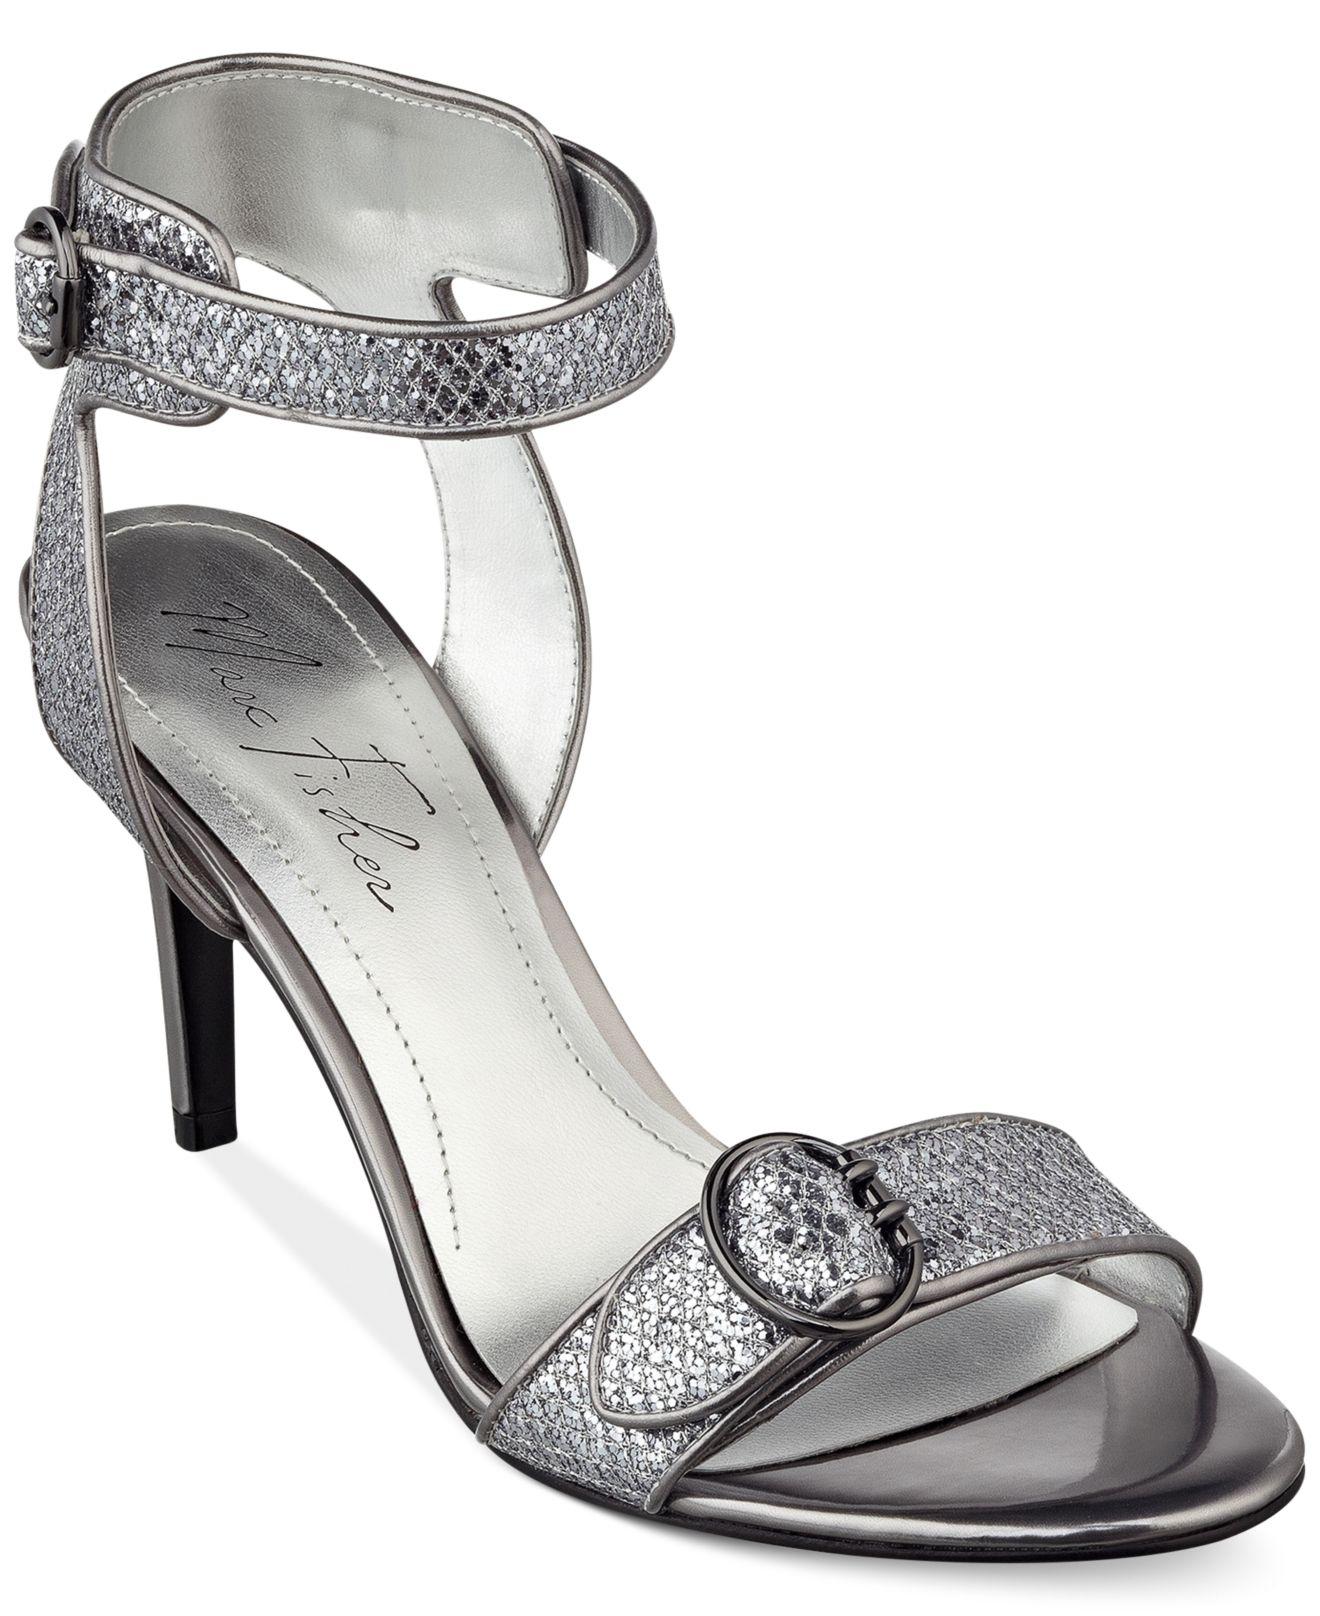 cdf197b78 Marc Fisher Malika Mid Heel Evening Sandals in Metallic - Lyst